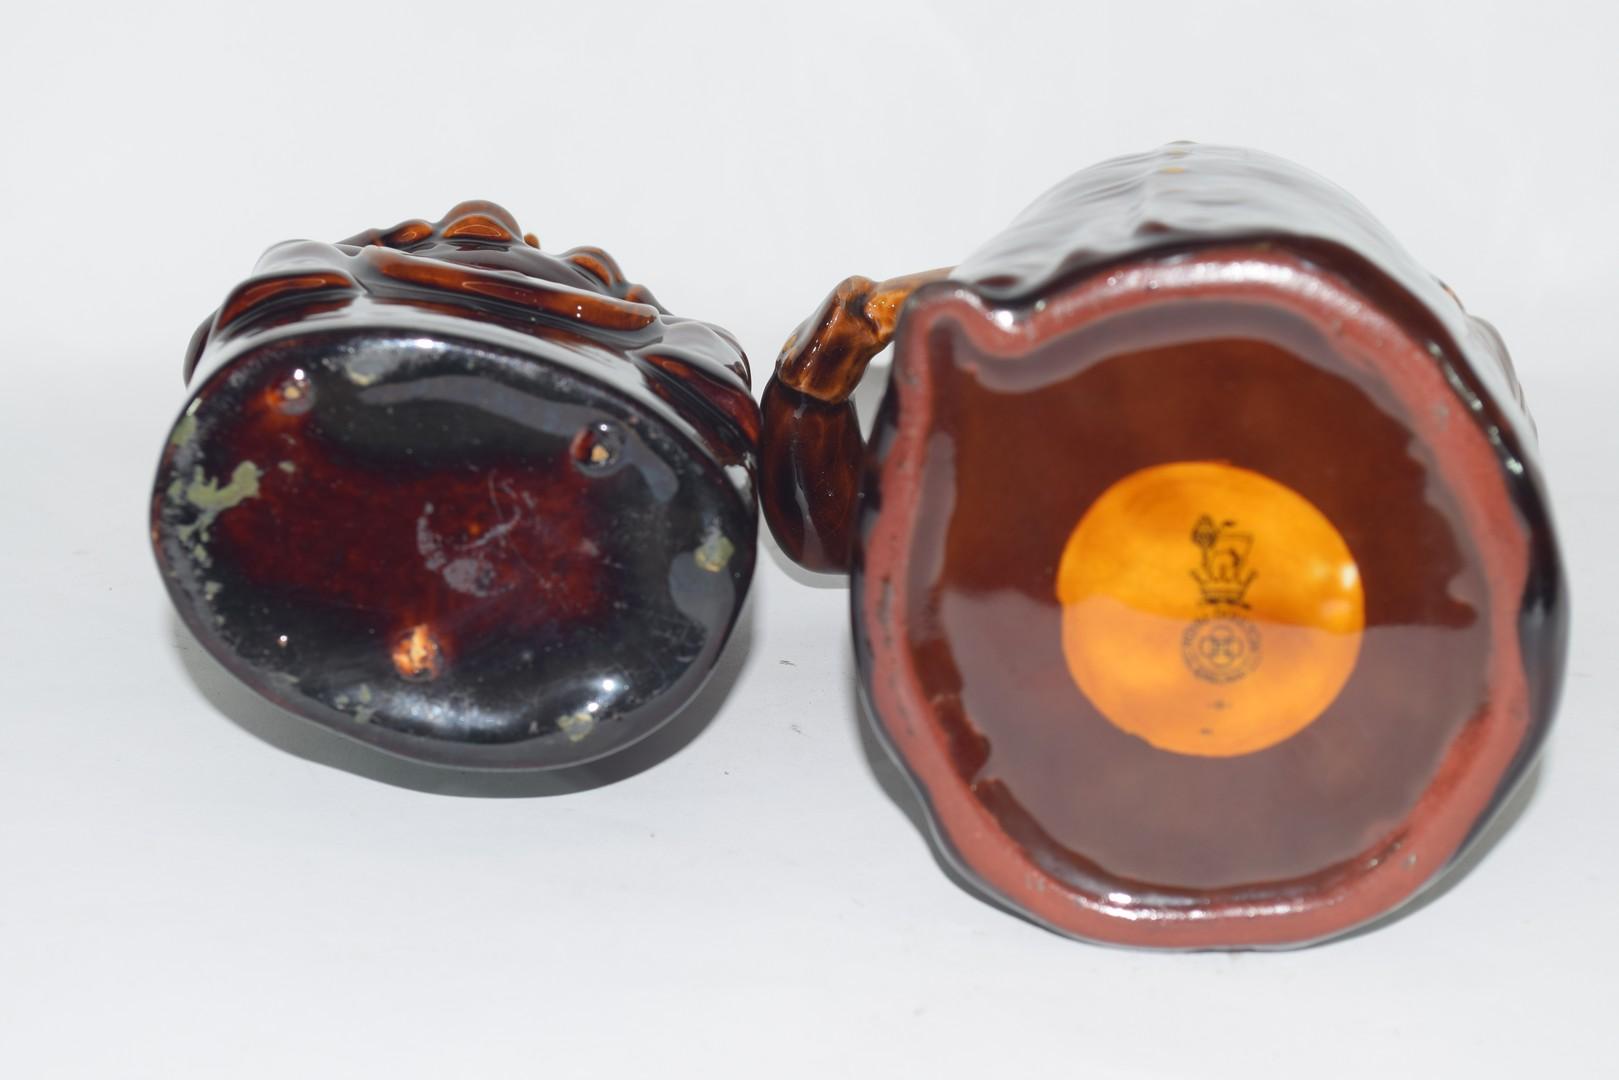 Royal Doulton Kingsware flask - Image 5 of 5